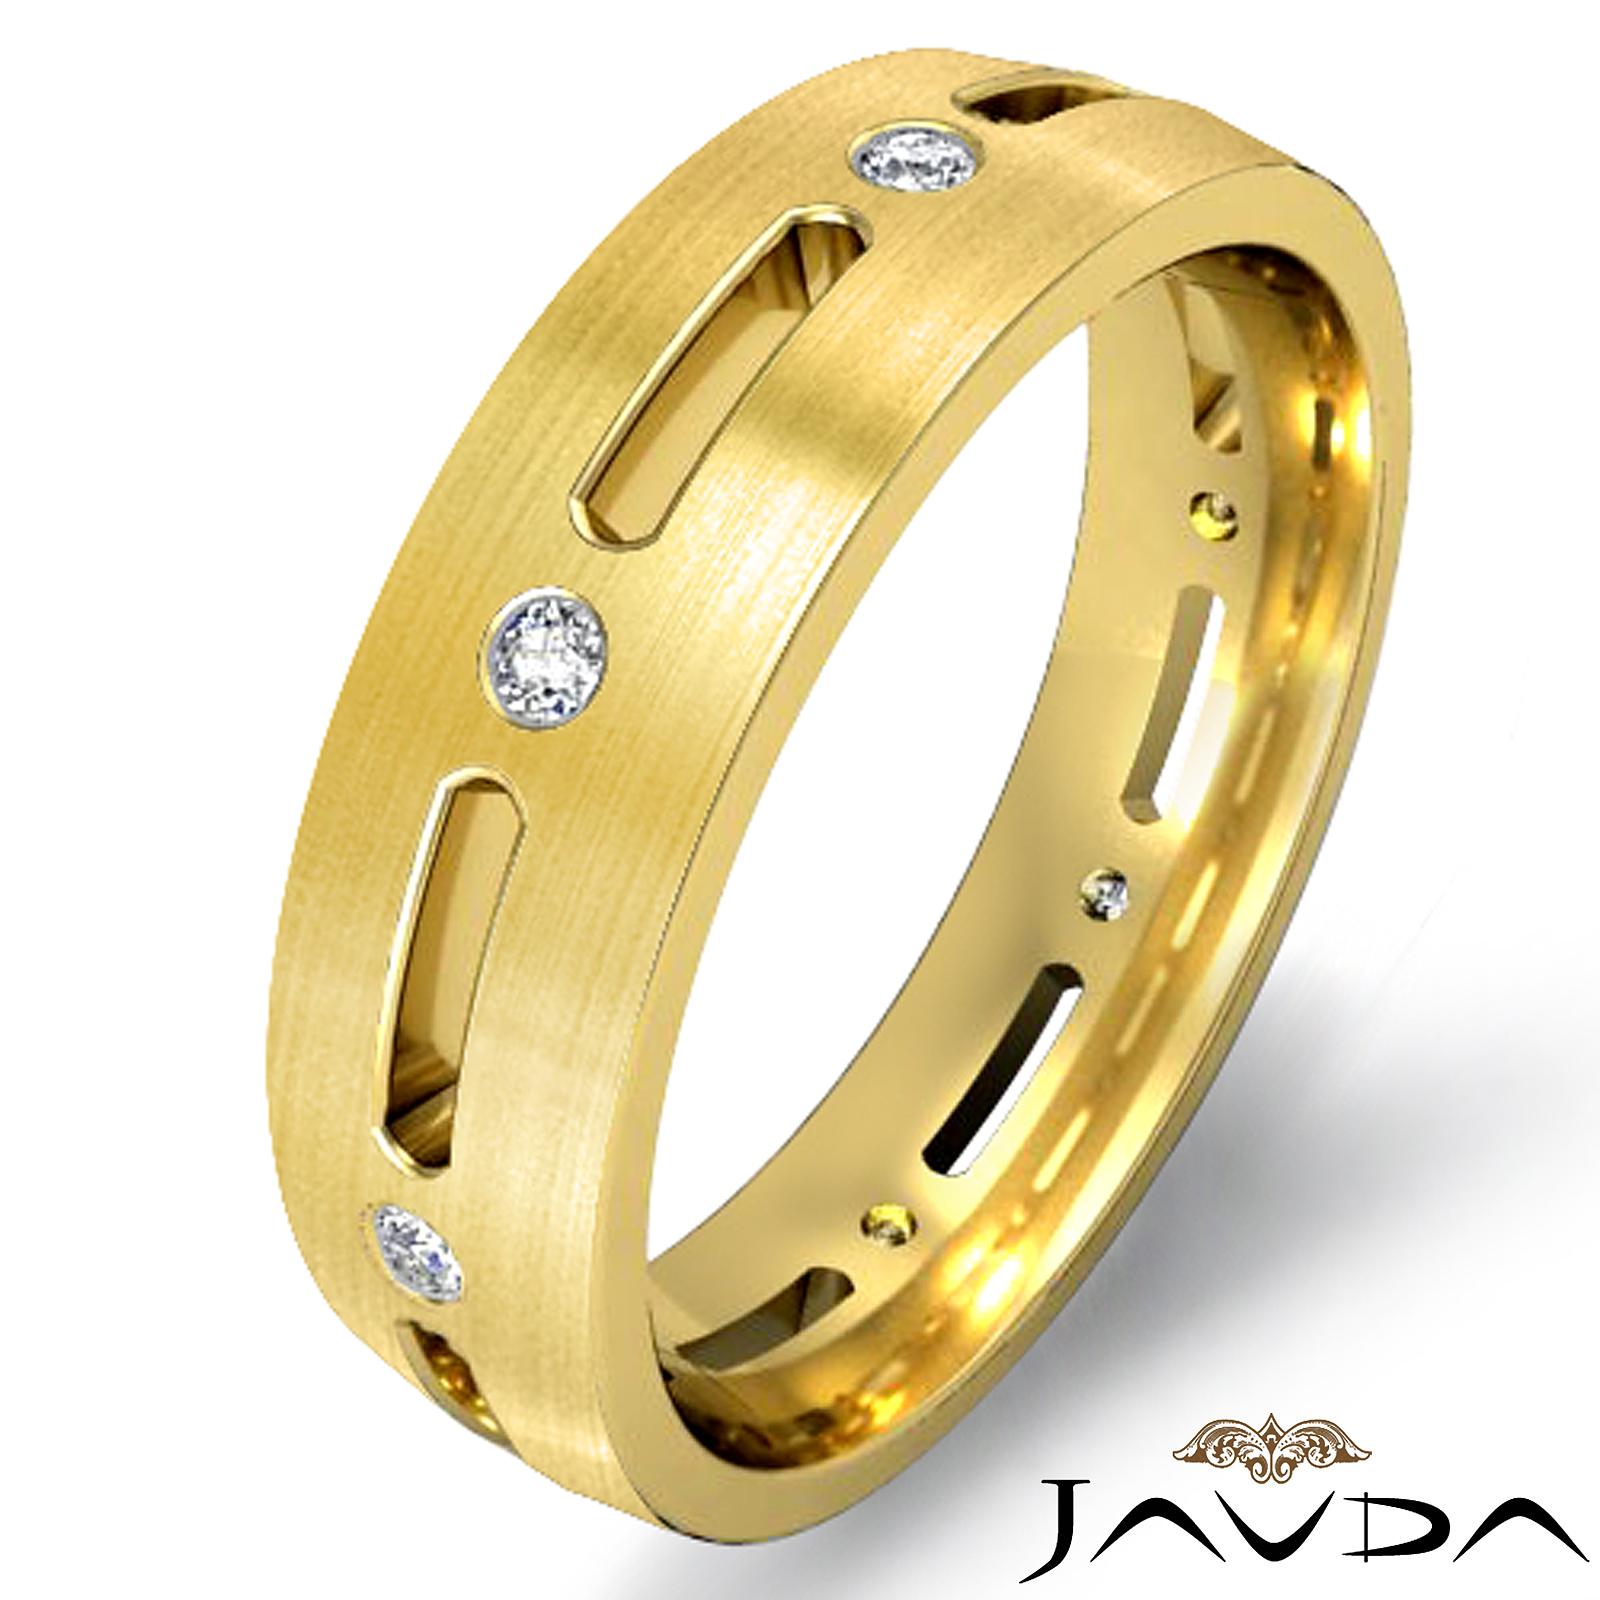 Round diamond bezel eternity wedding mens dome band ring for Mens eternity wedding band